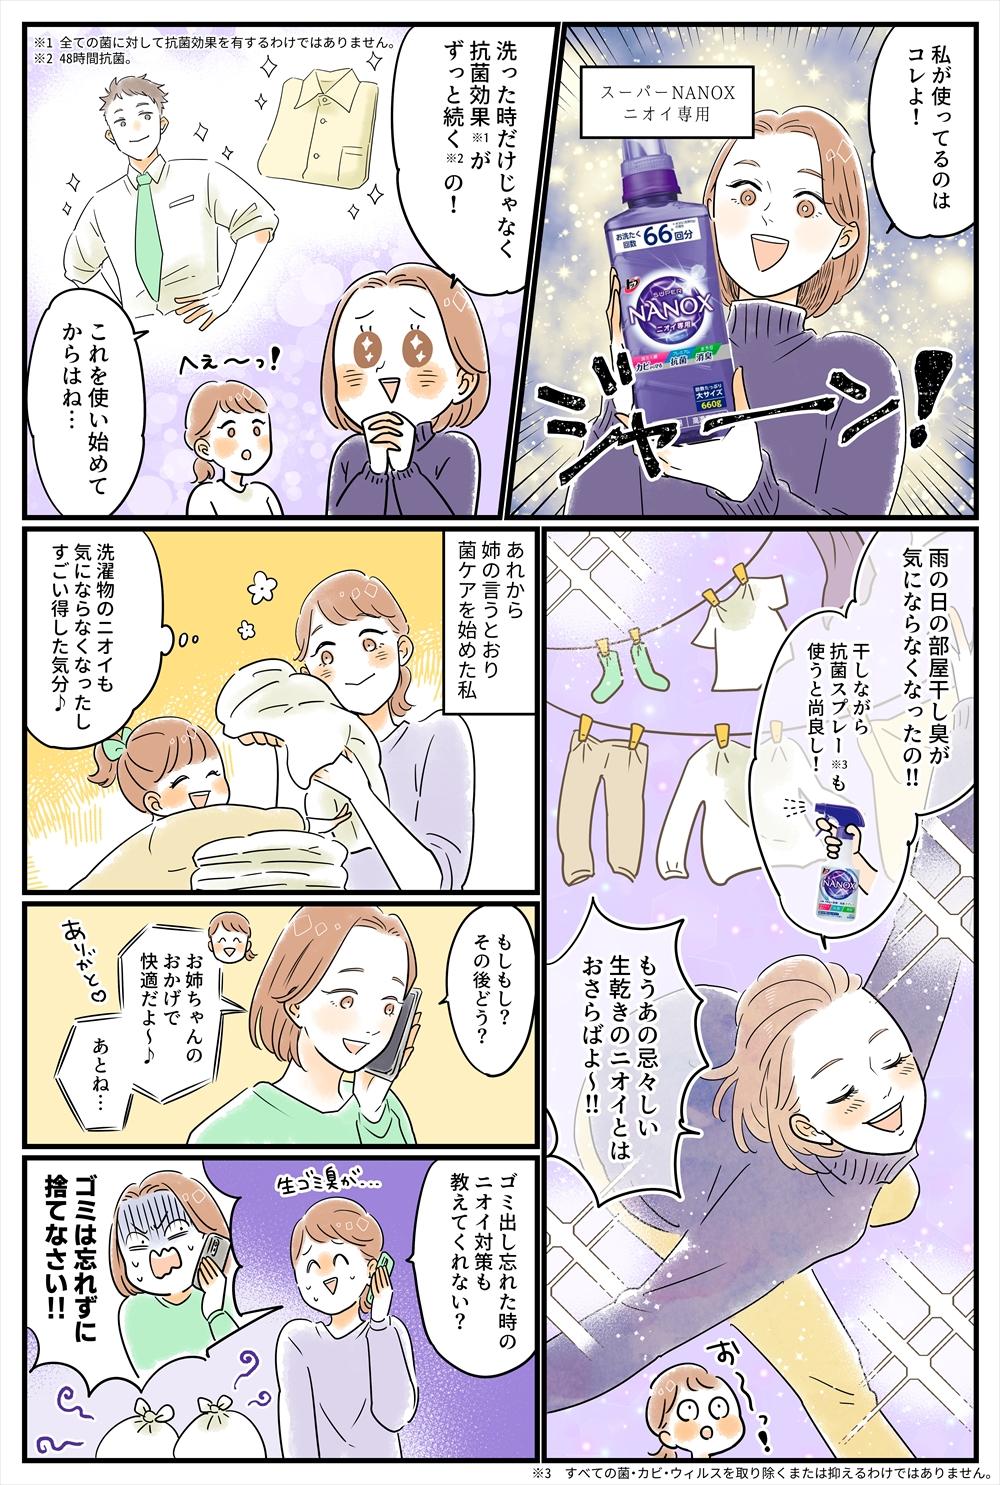 NANOXウェブ漫画-4P_r